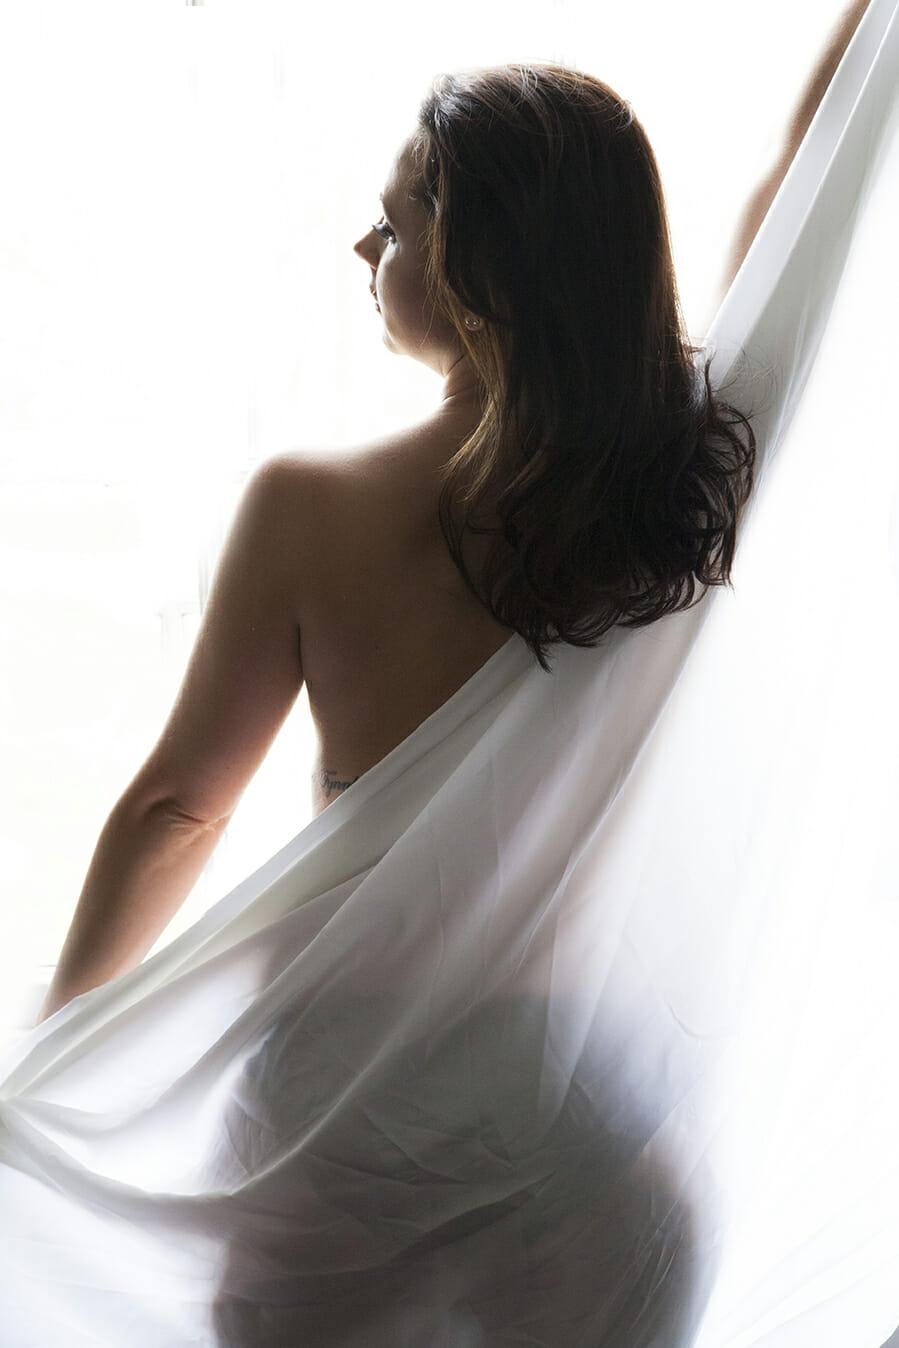 White sheet Silhouette